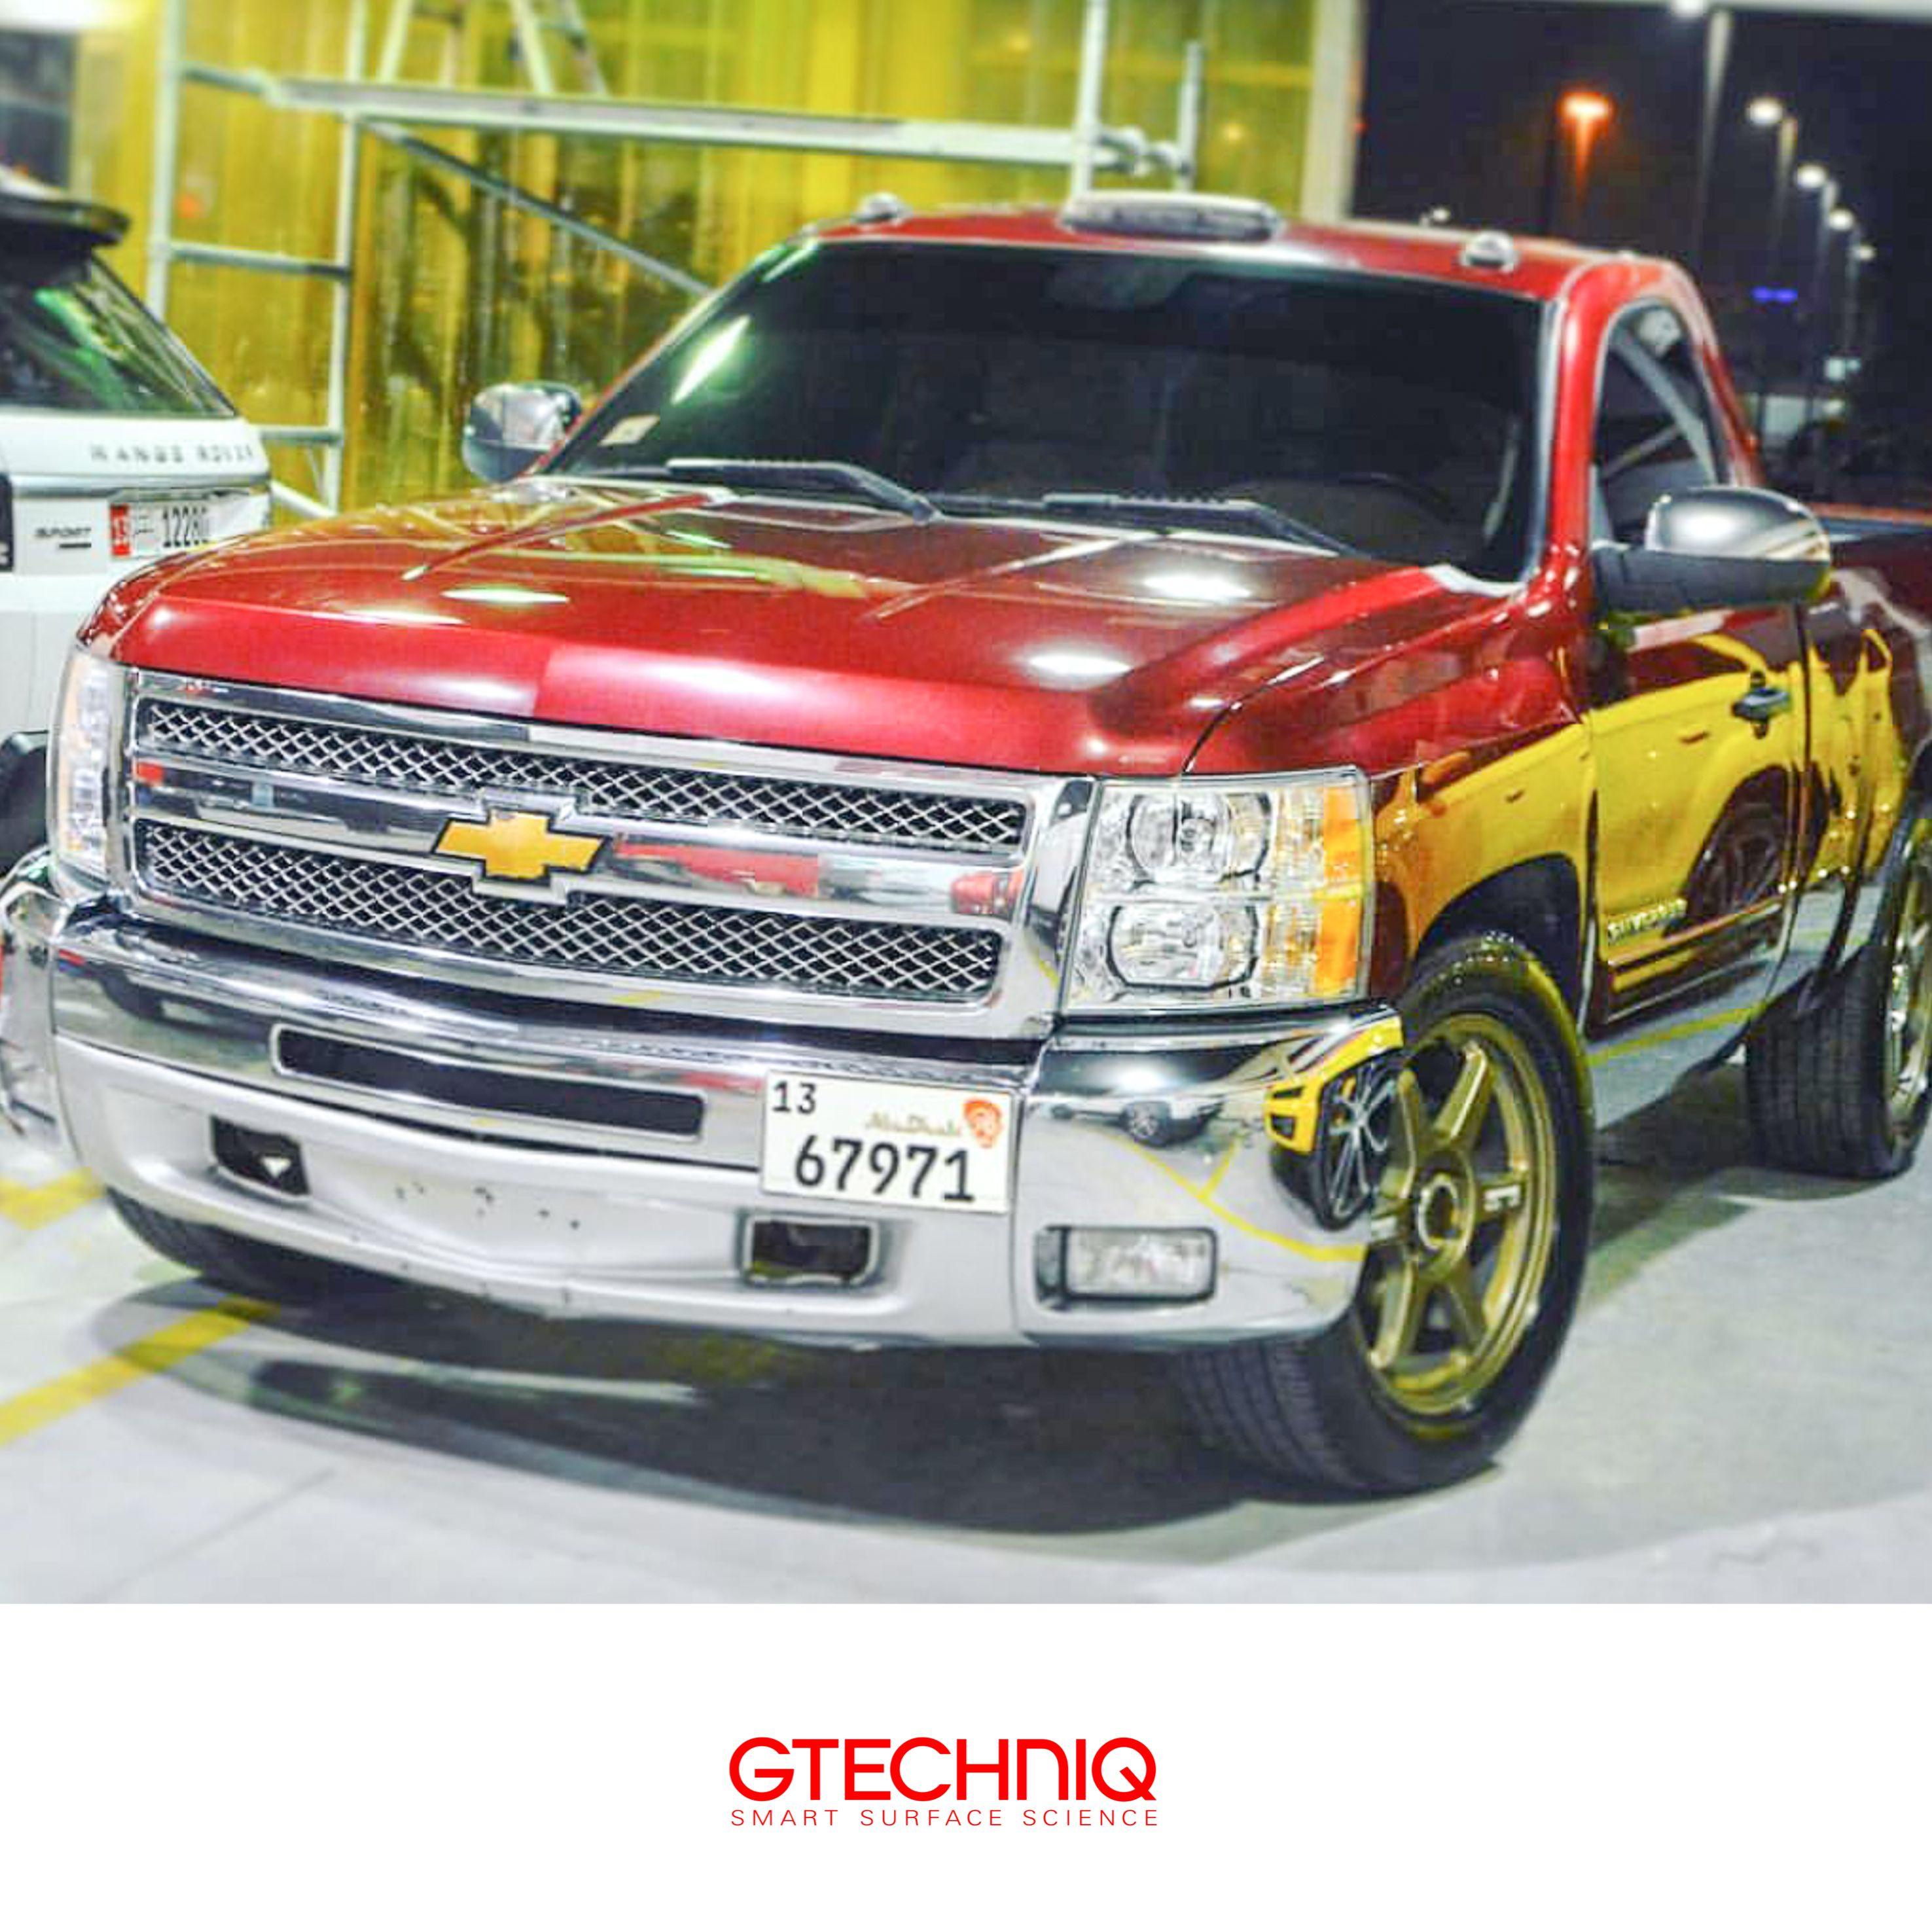 #GMC Sierra Pickup Truck Protected By Gtechniq Stockist